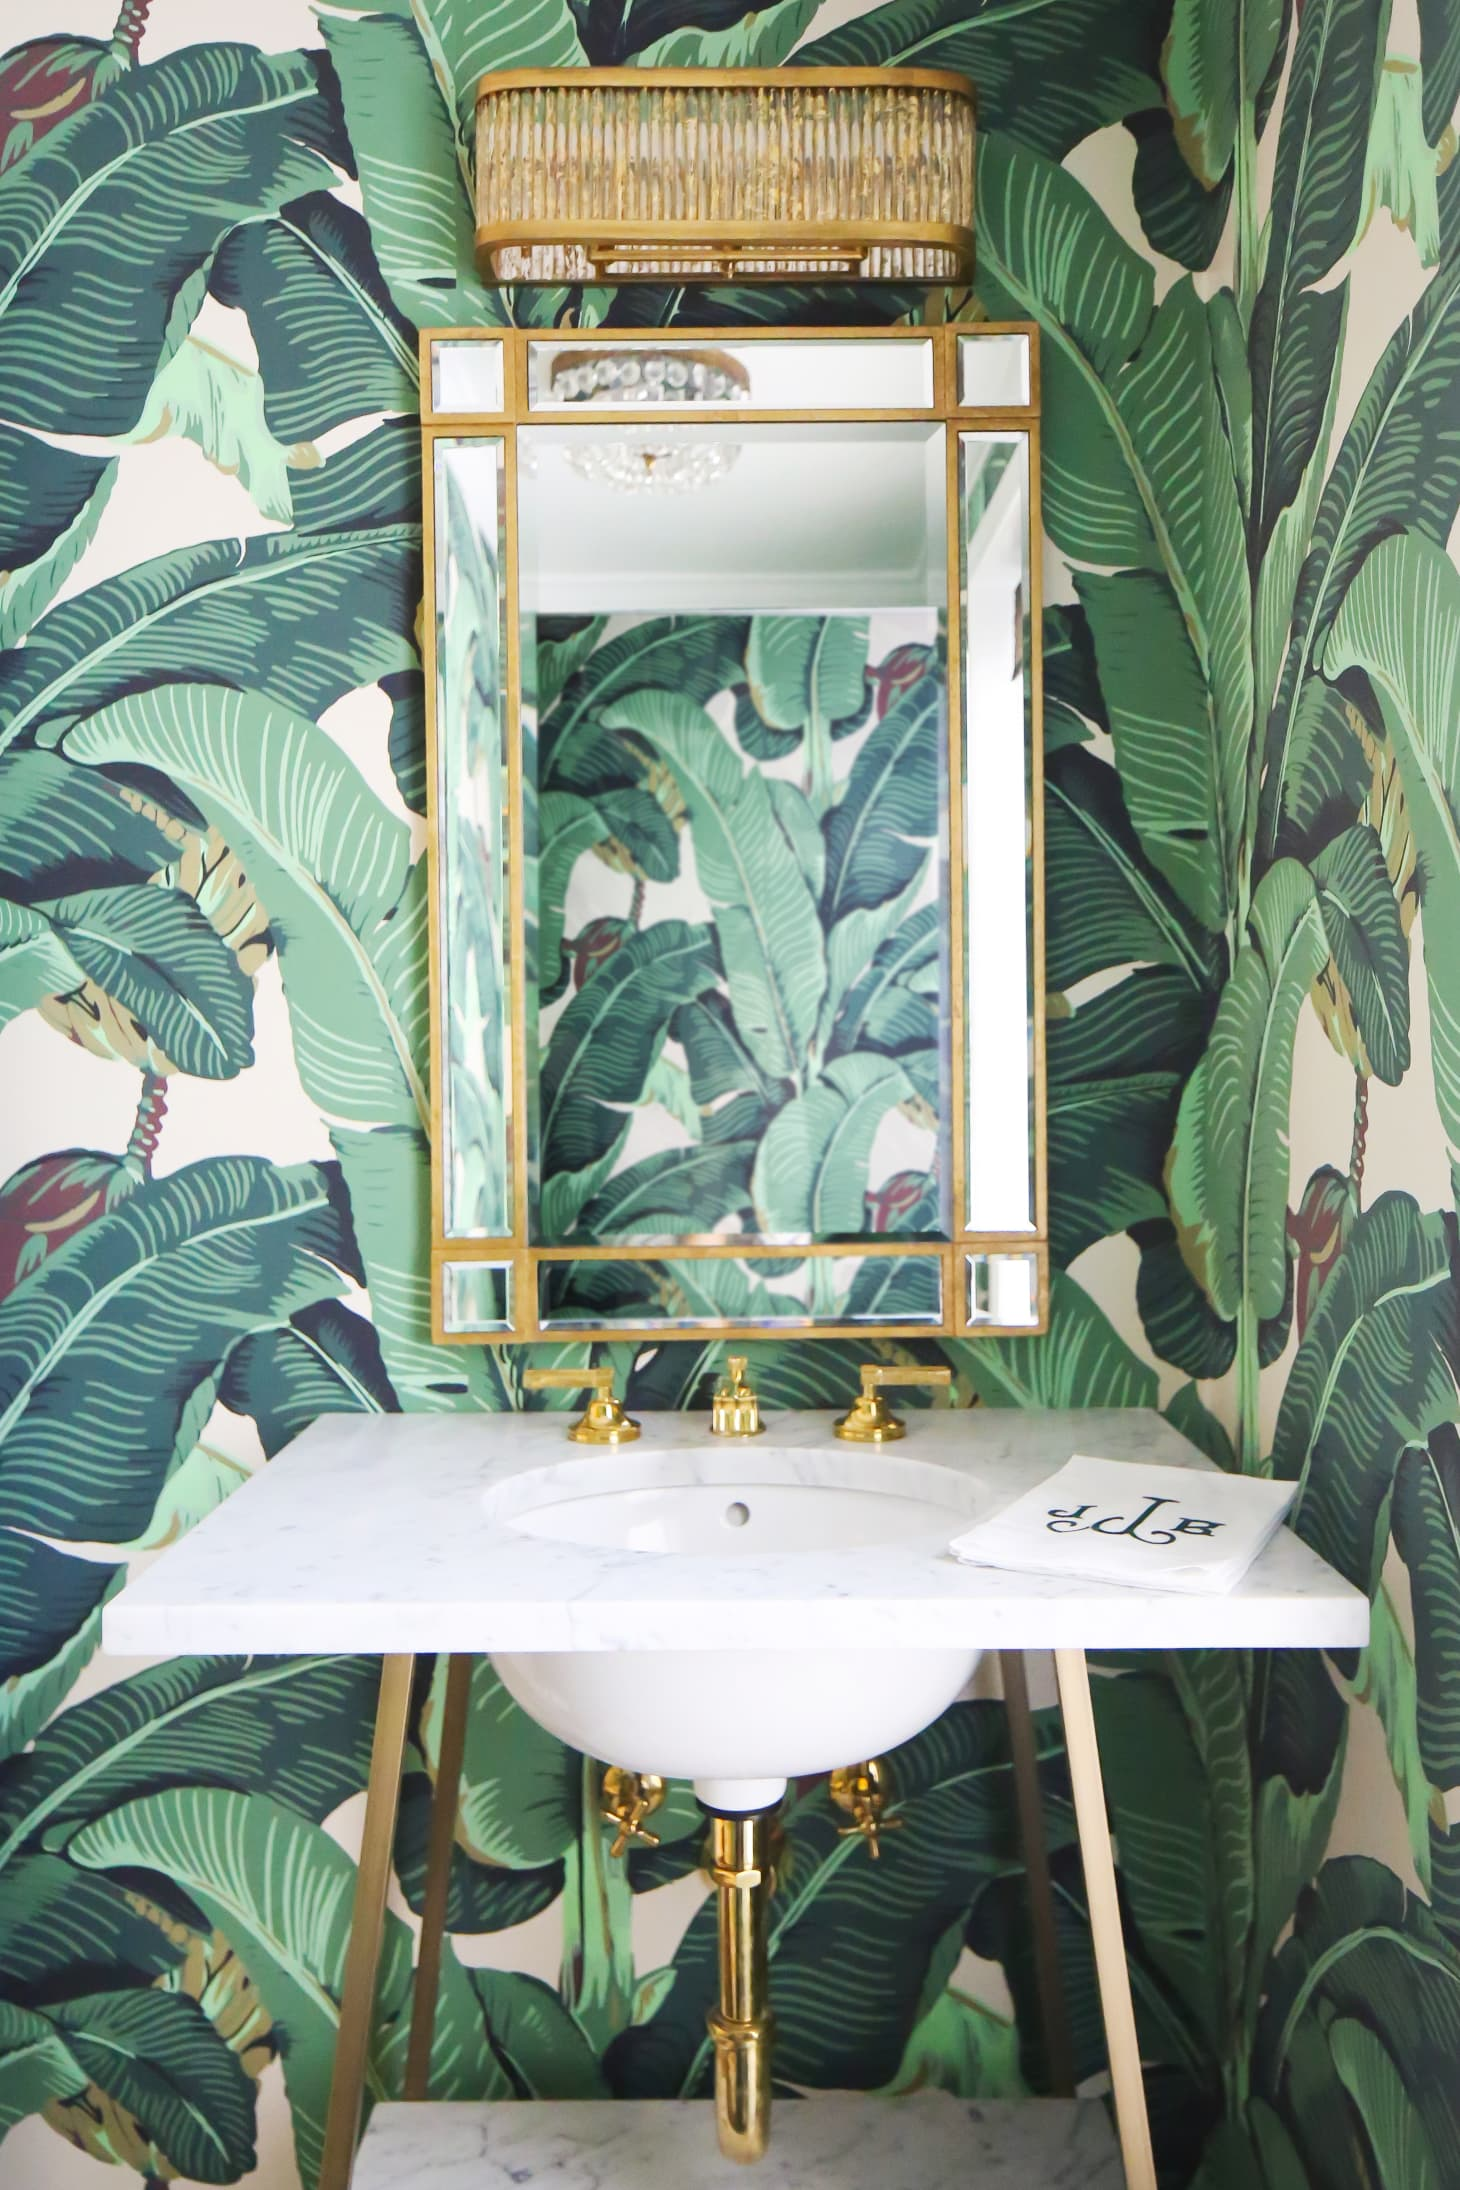 25 Small Bathroom Storage & Design Ideas - Storage ... on Small Apartment Bathroom Storage Ideas  id=94893